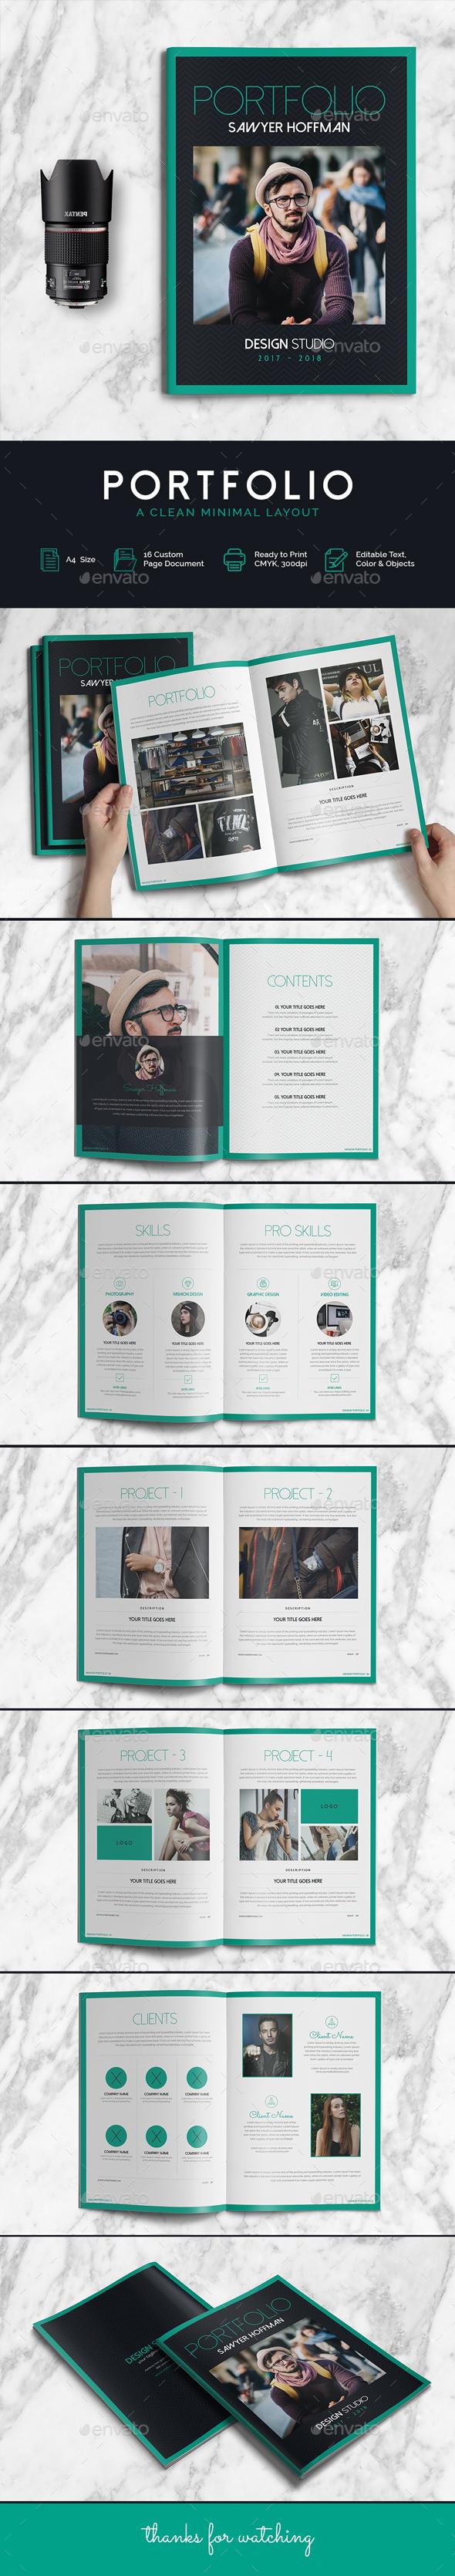 Portfolio - Print Templates